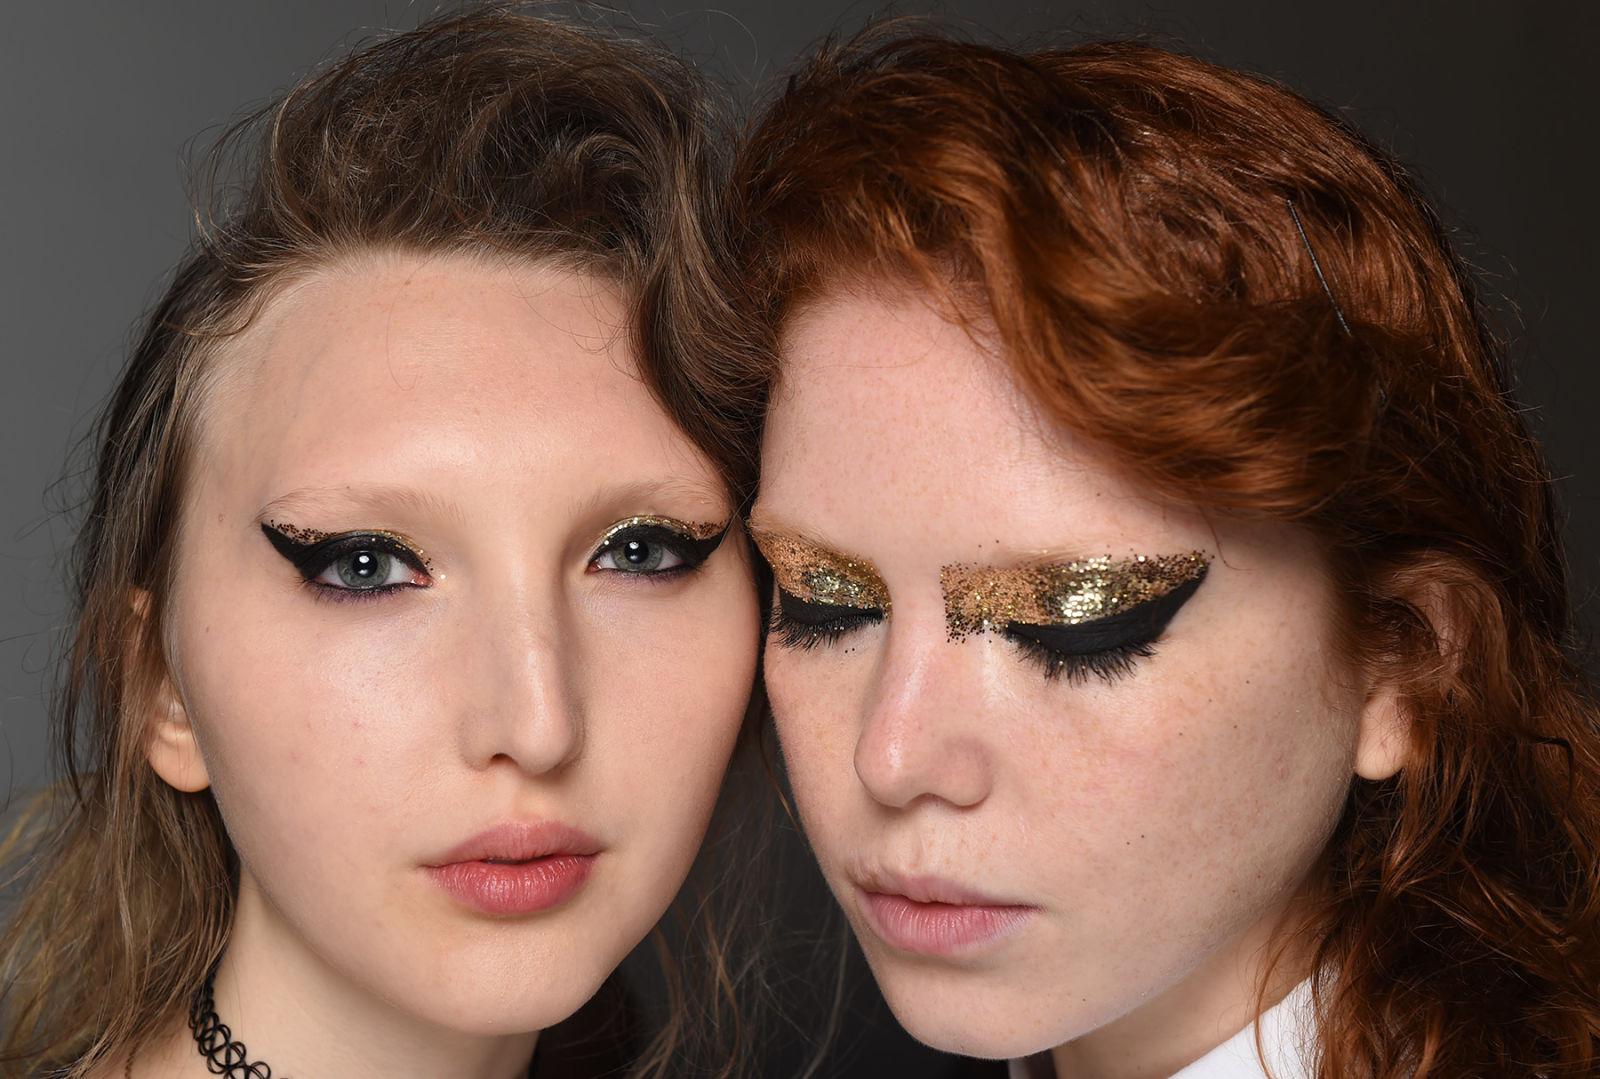 Photo 11 metallic eyes - Copy.jpg